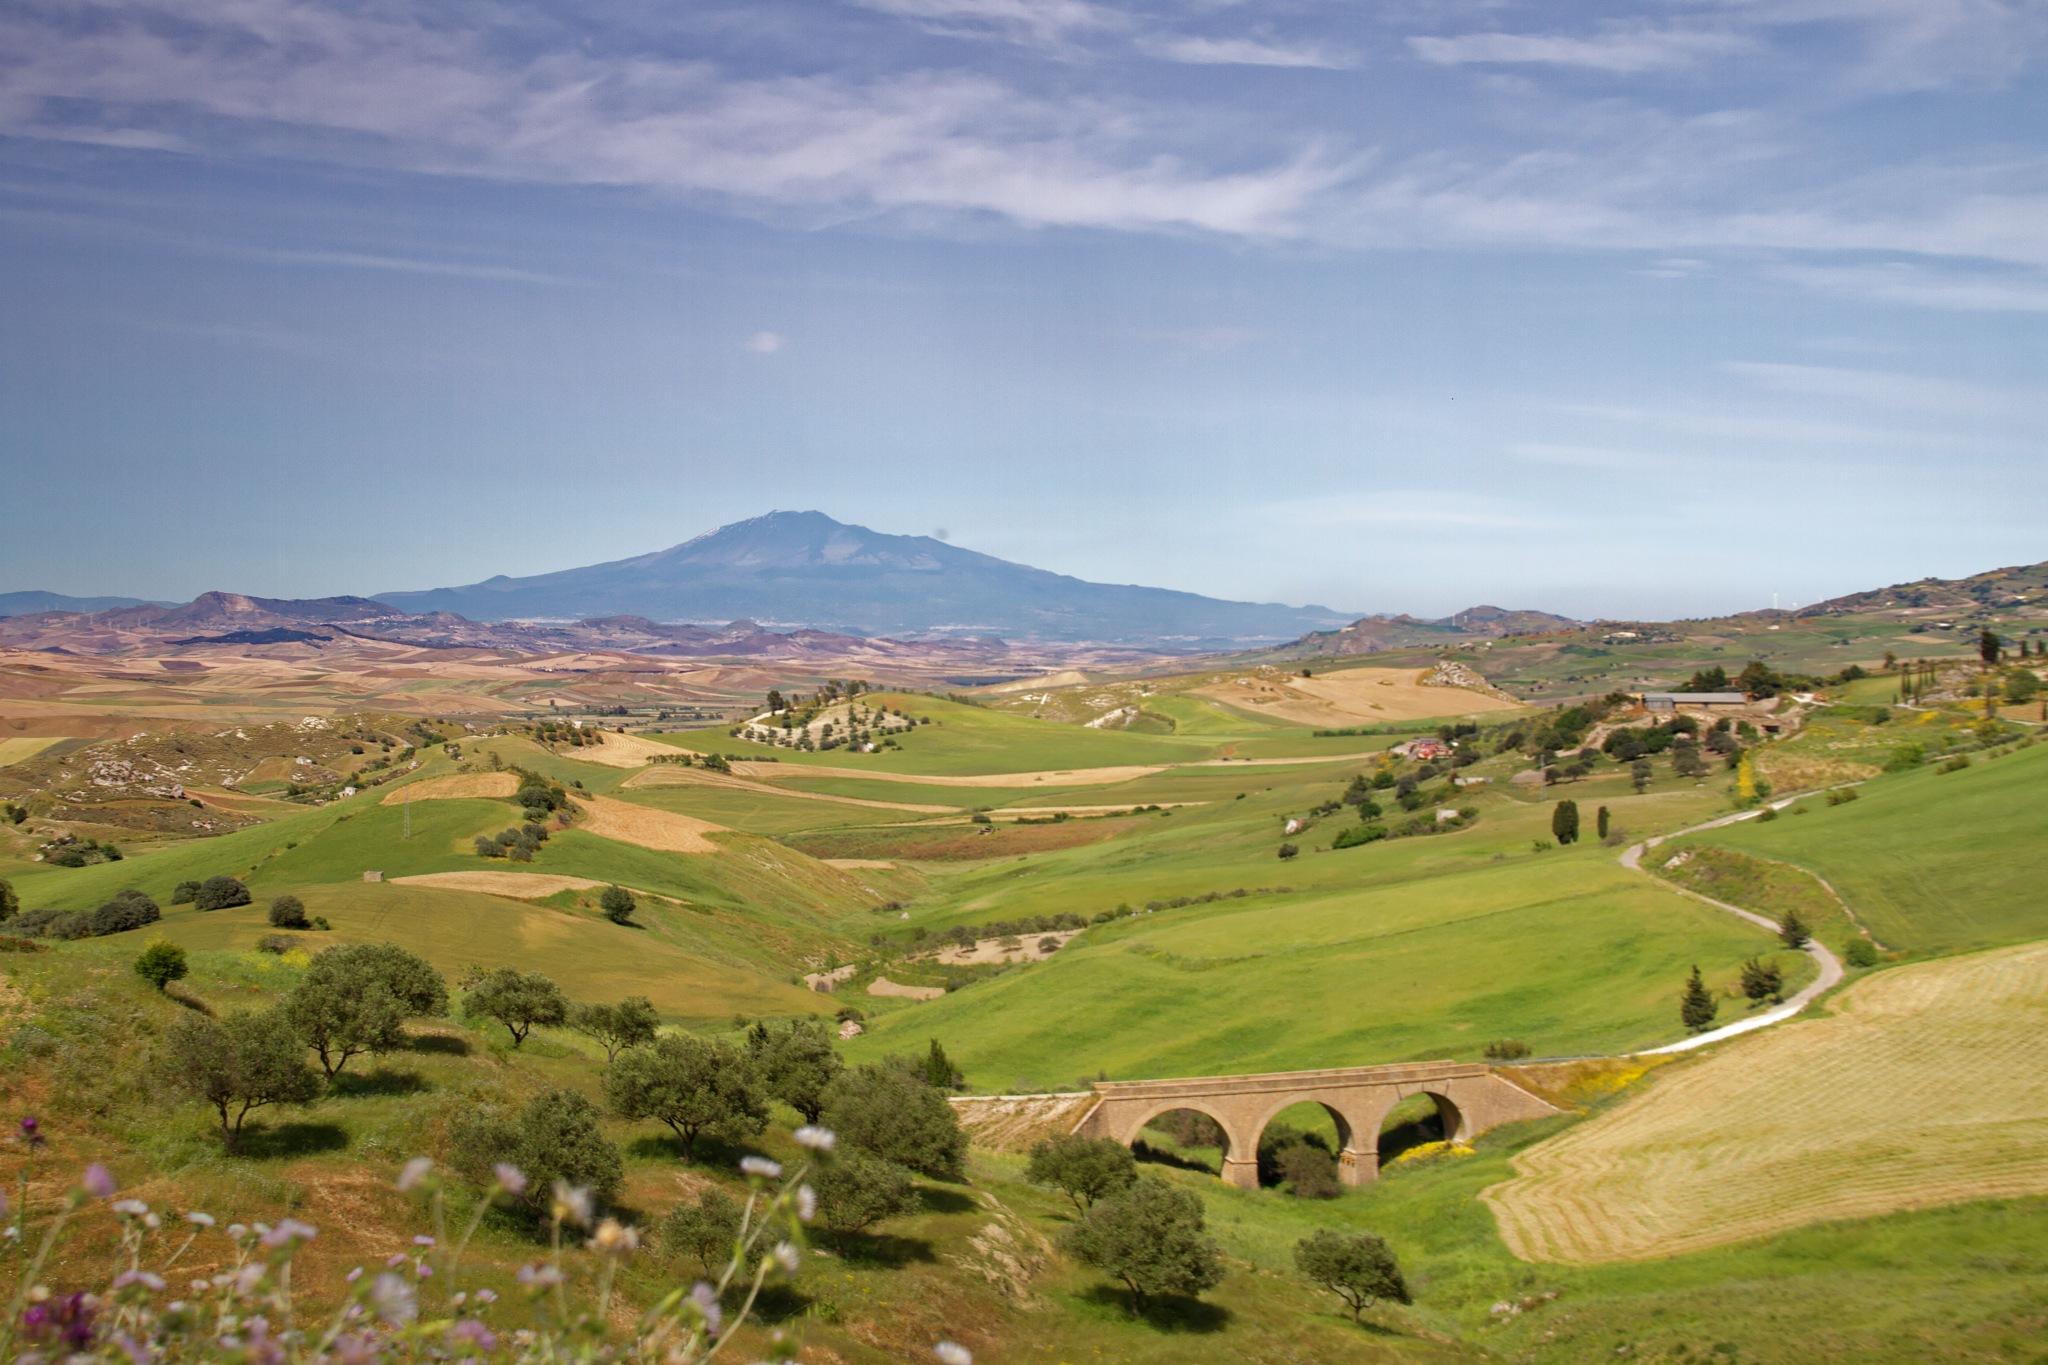 Sicily by piero marino